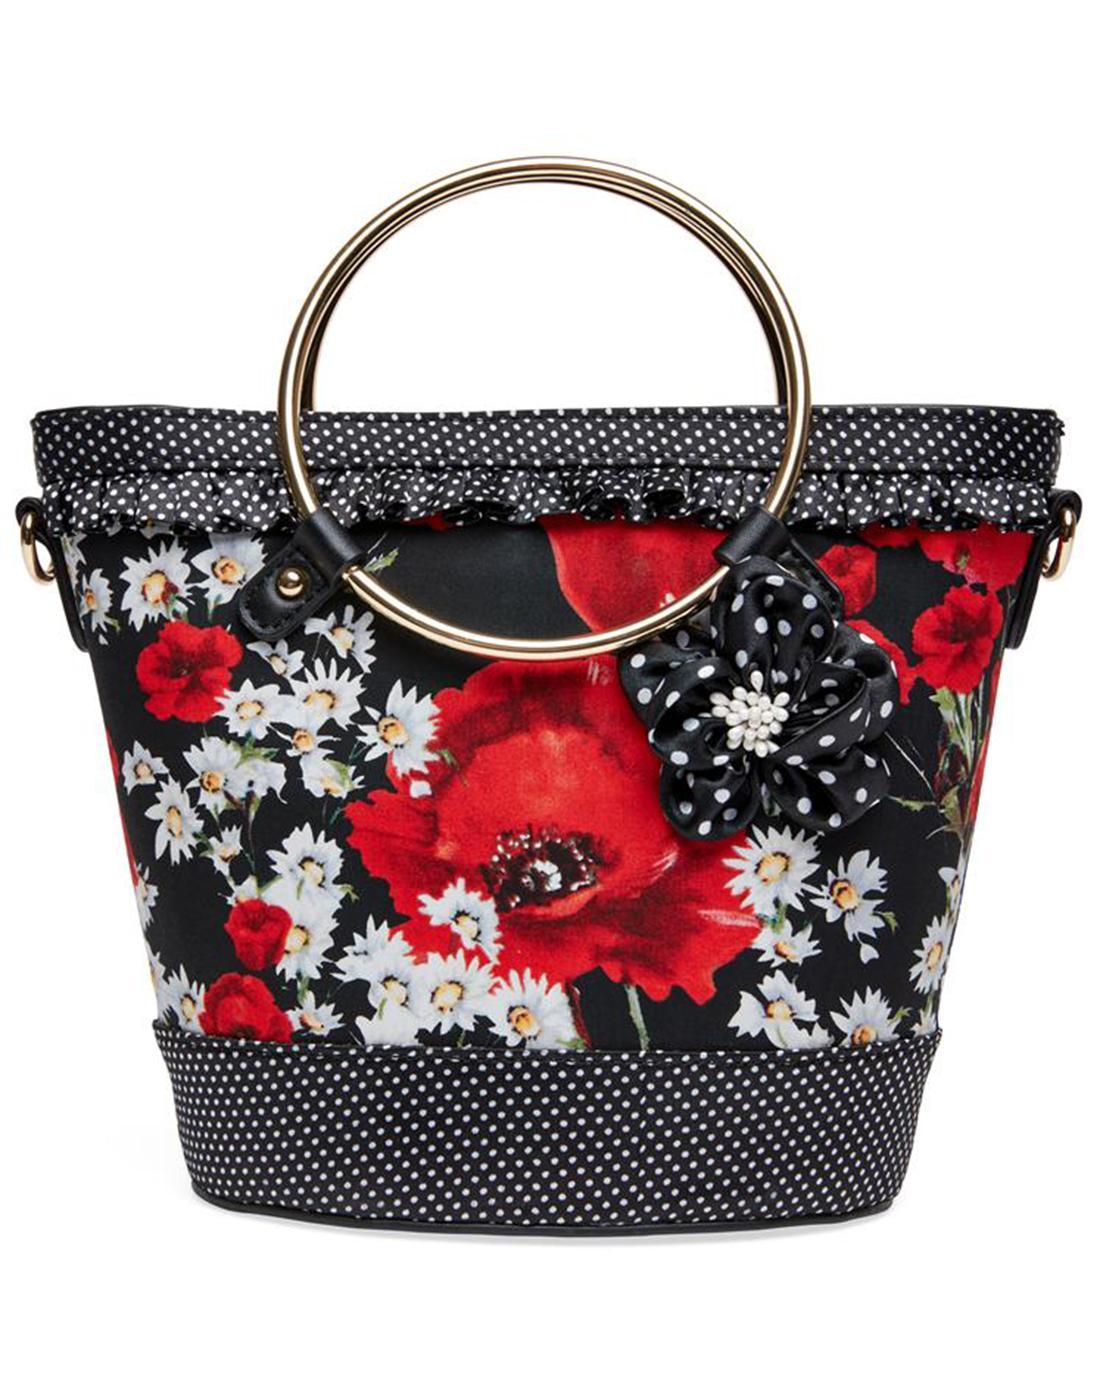 Natalia JOE BROWNS 1970'S Vintage Floral Handbag